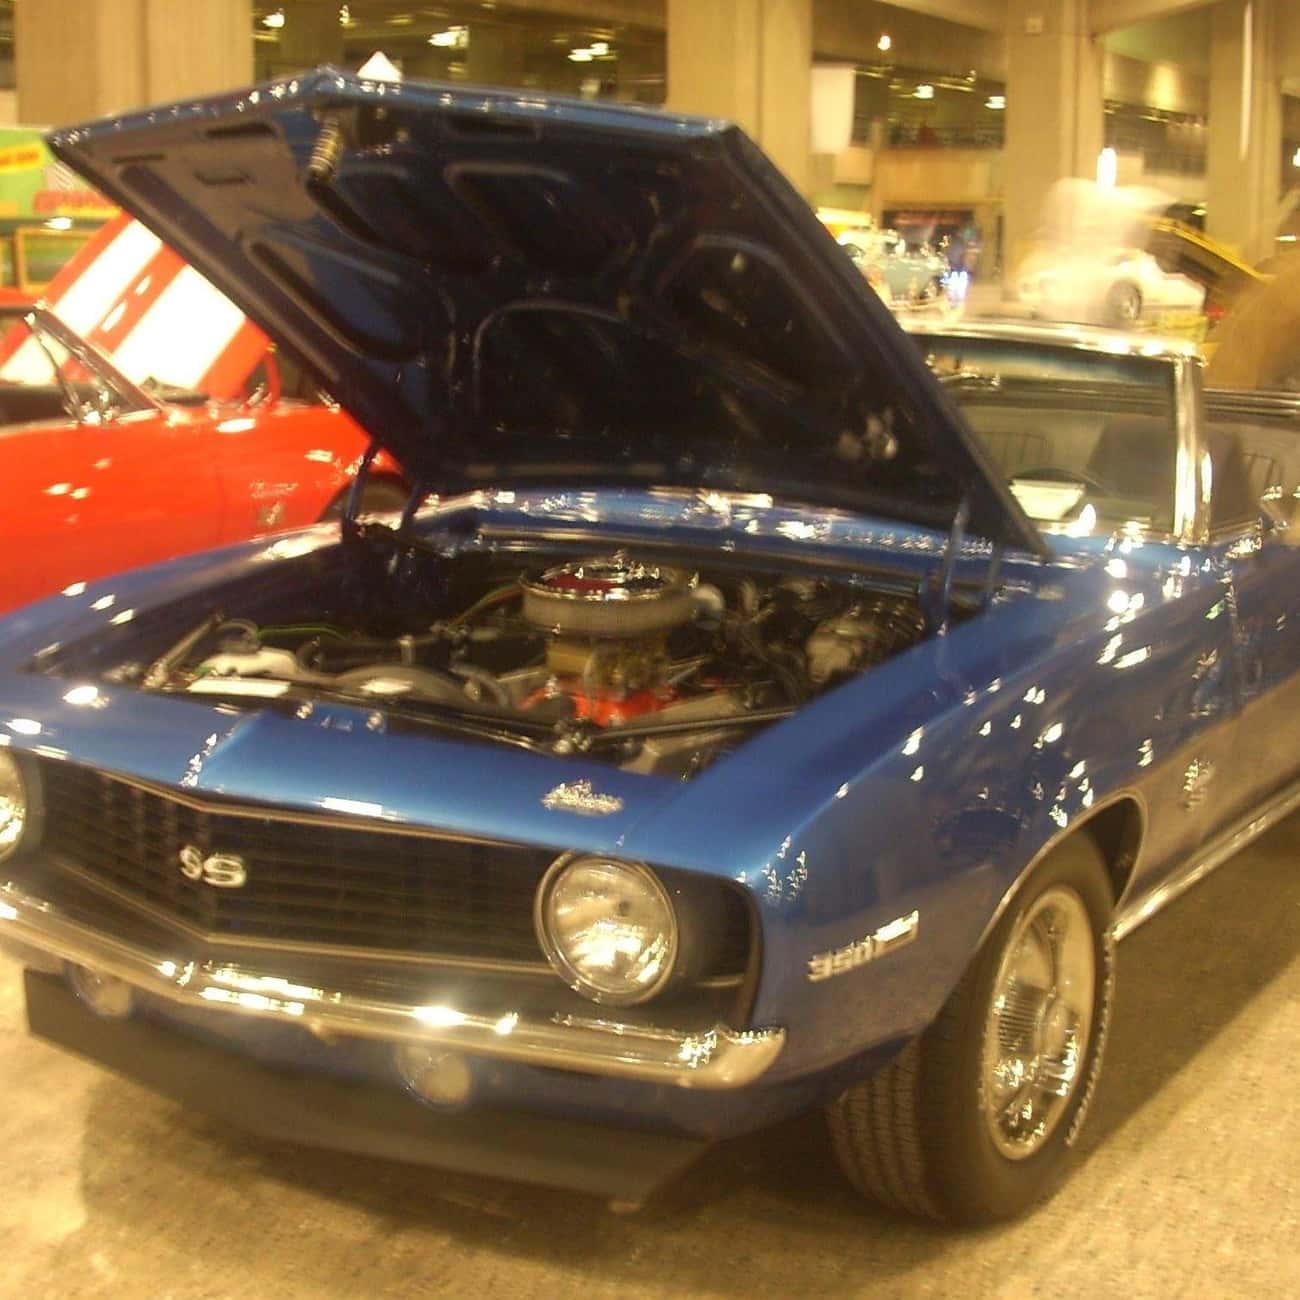 1969 Chevrolet Camaro Chevrolet Camaro Convertible (First Generation)